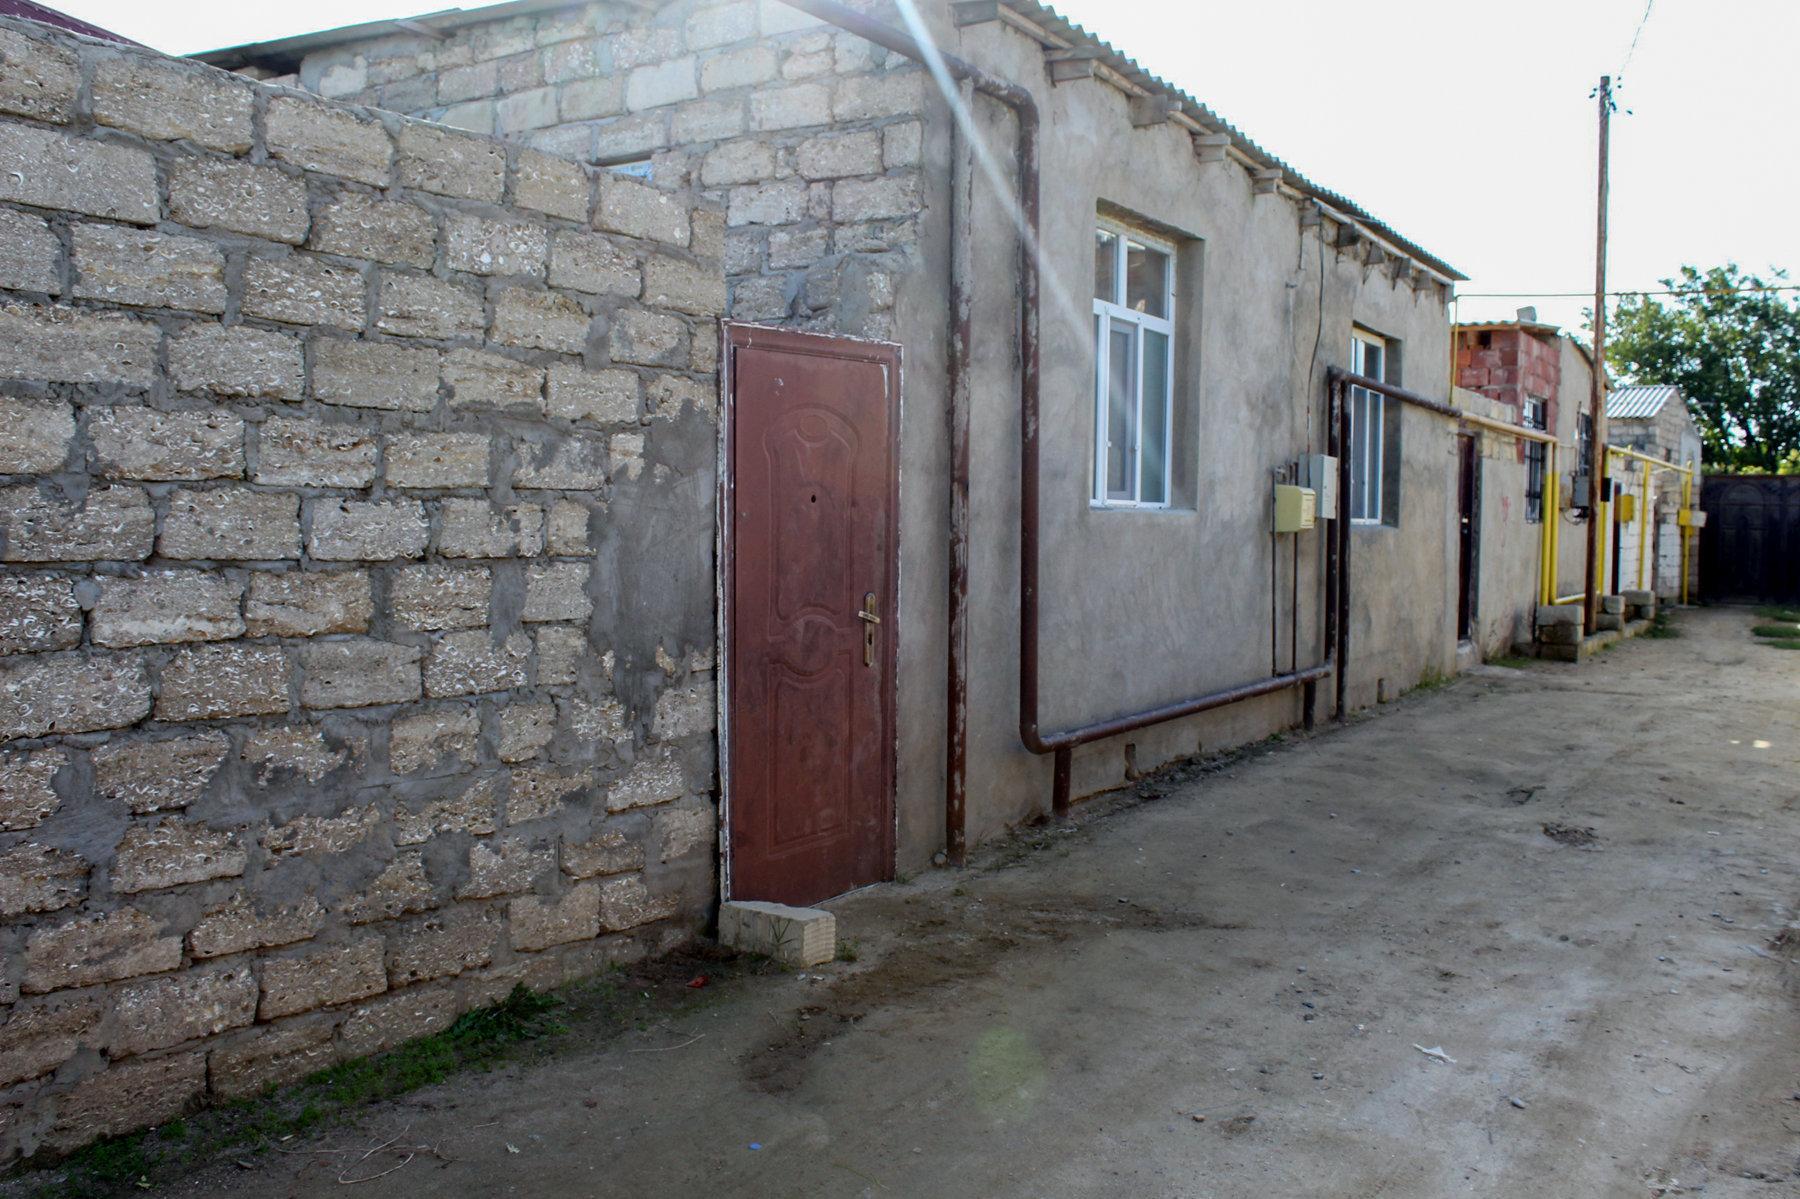 Terymurgilin evi